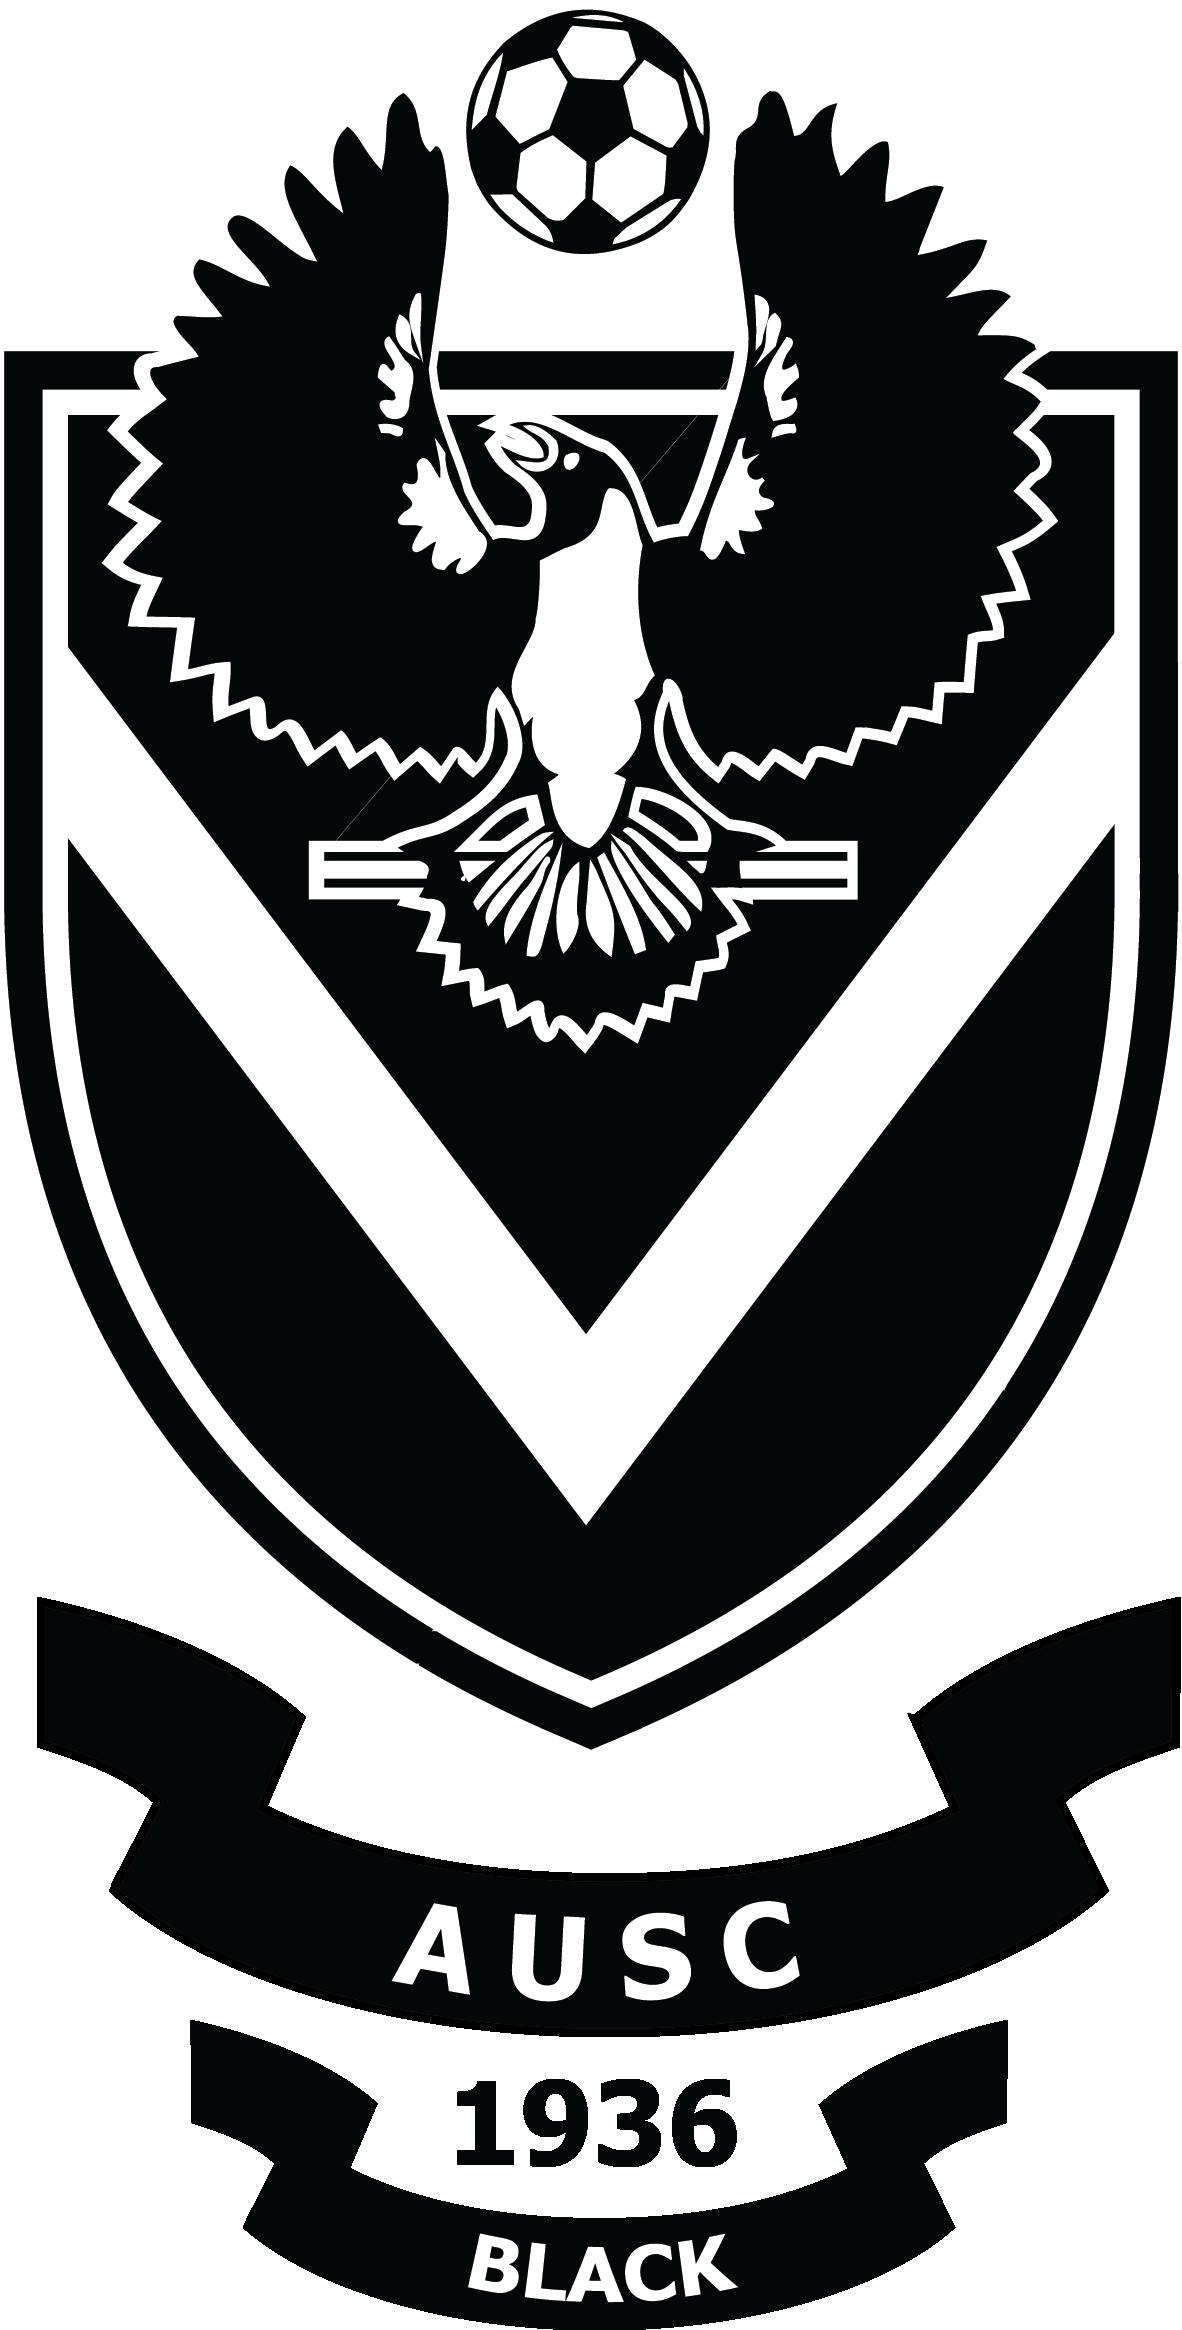 AUSC Black logo